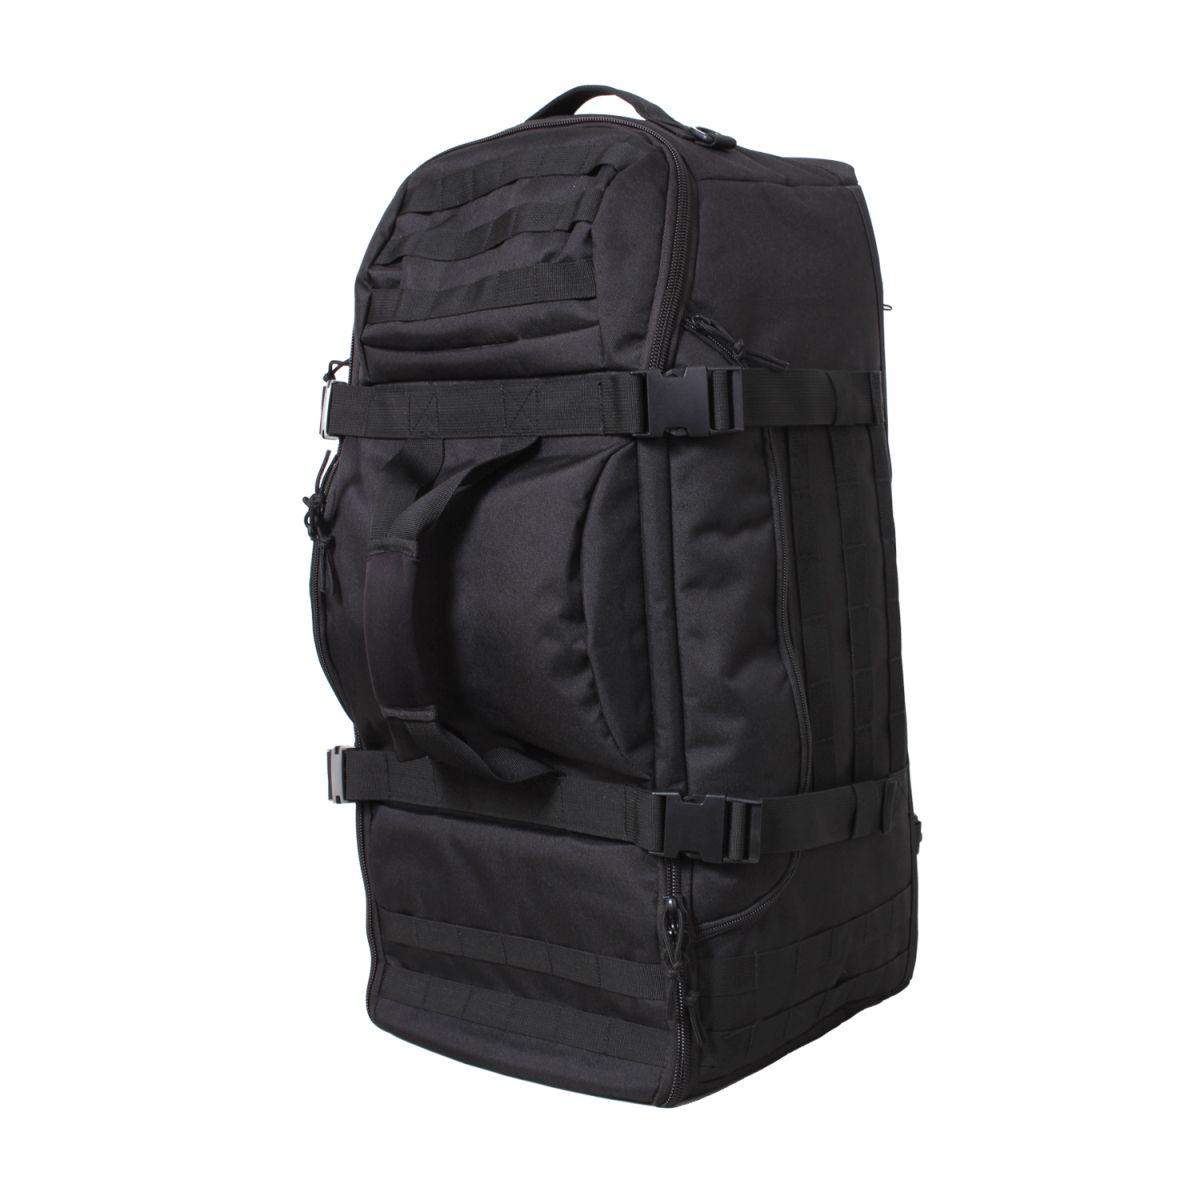 Batoh taška CONVERTIBLE MISSION 3v1 ČERNÝ - ROTHCO - Army shop ... 7fdfc4b08c